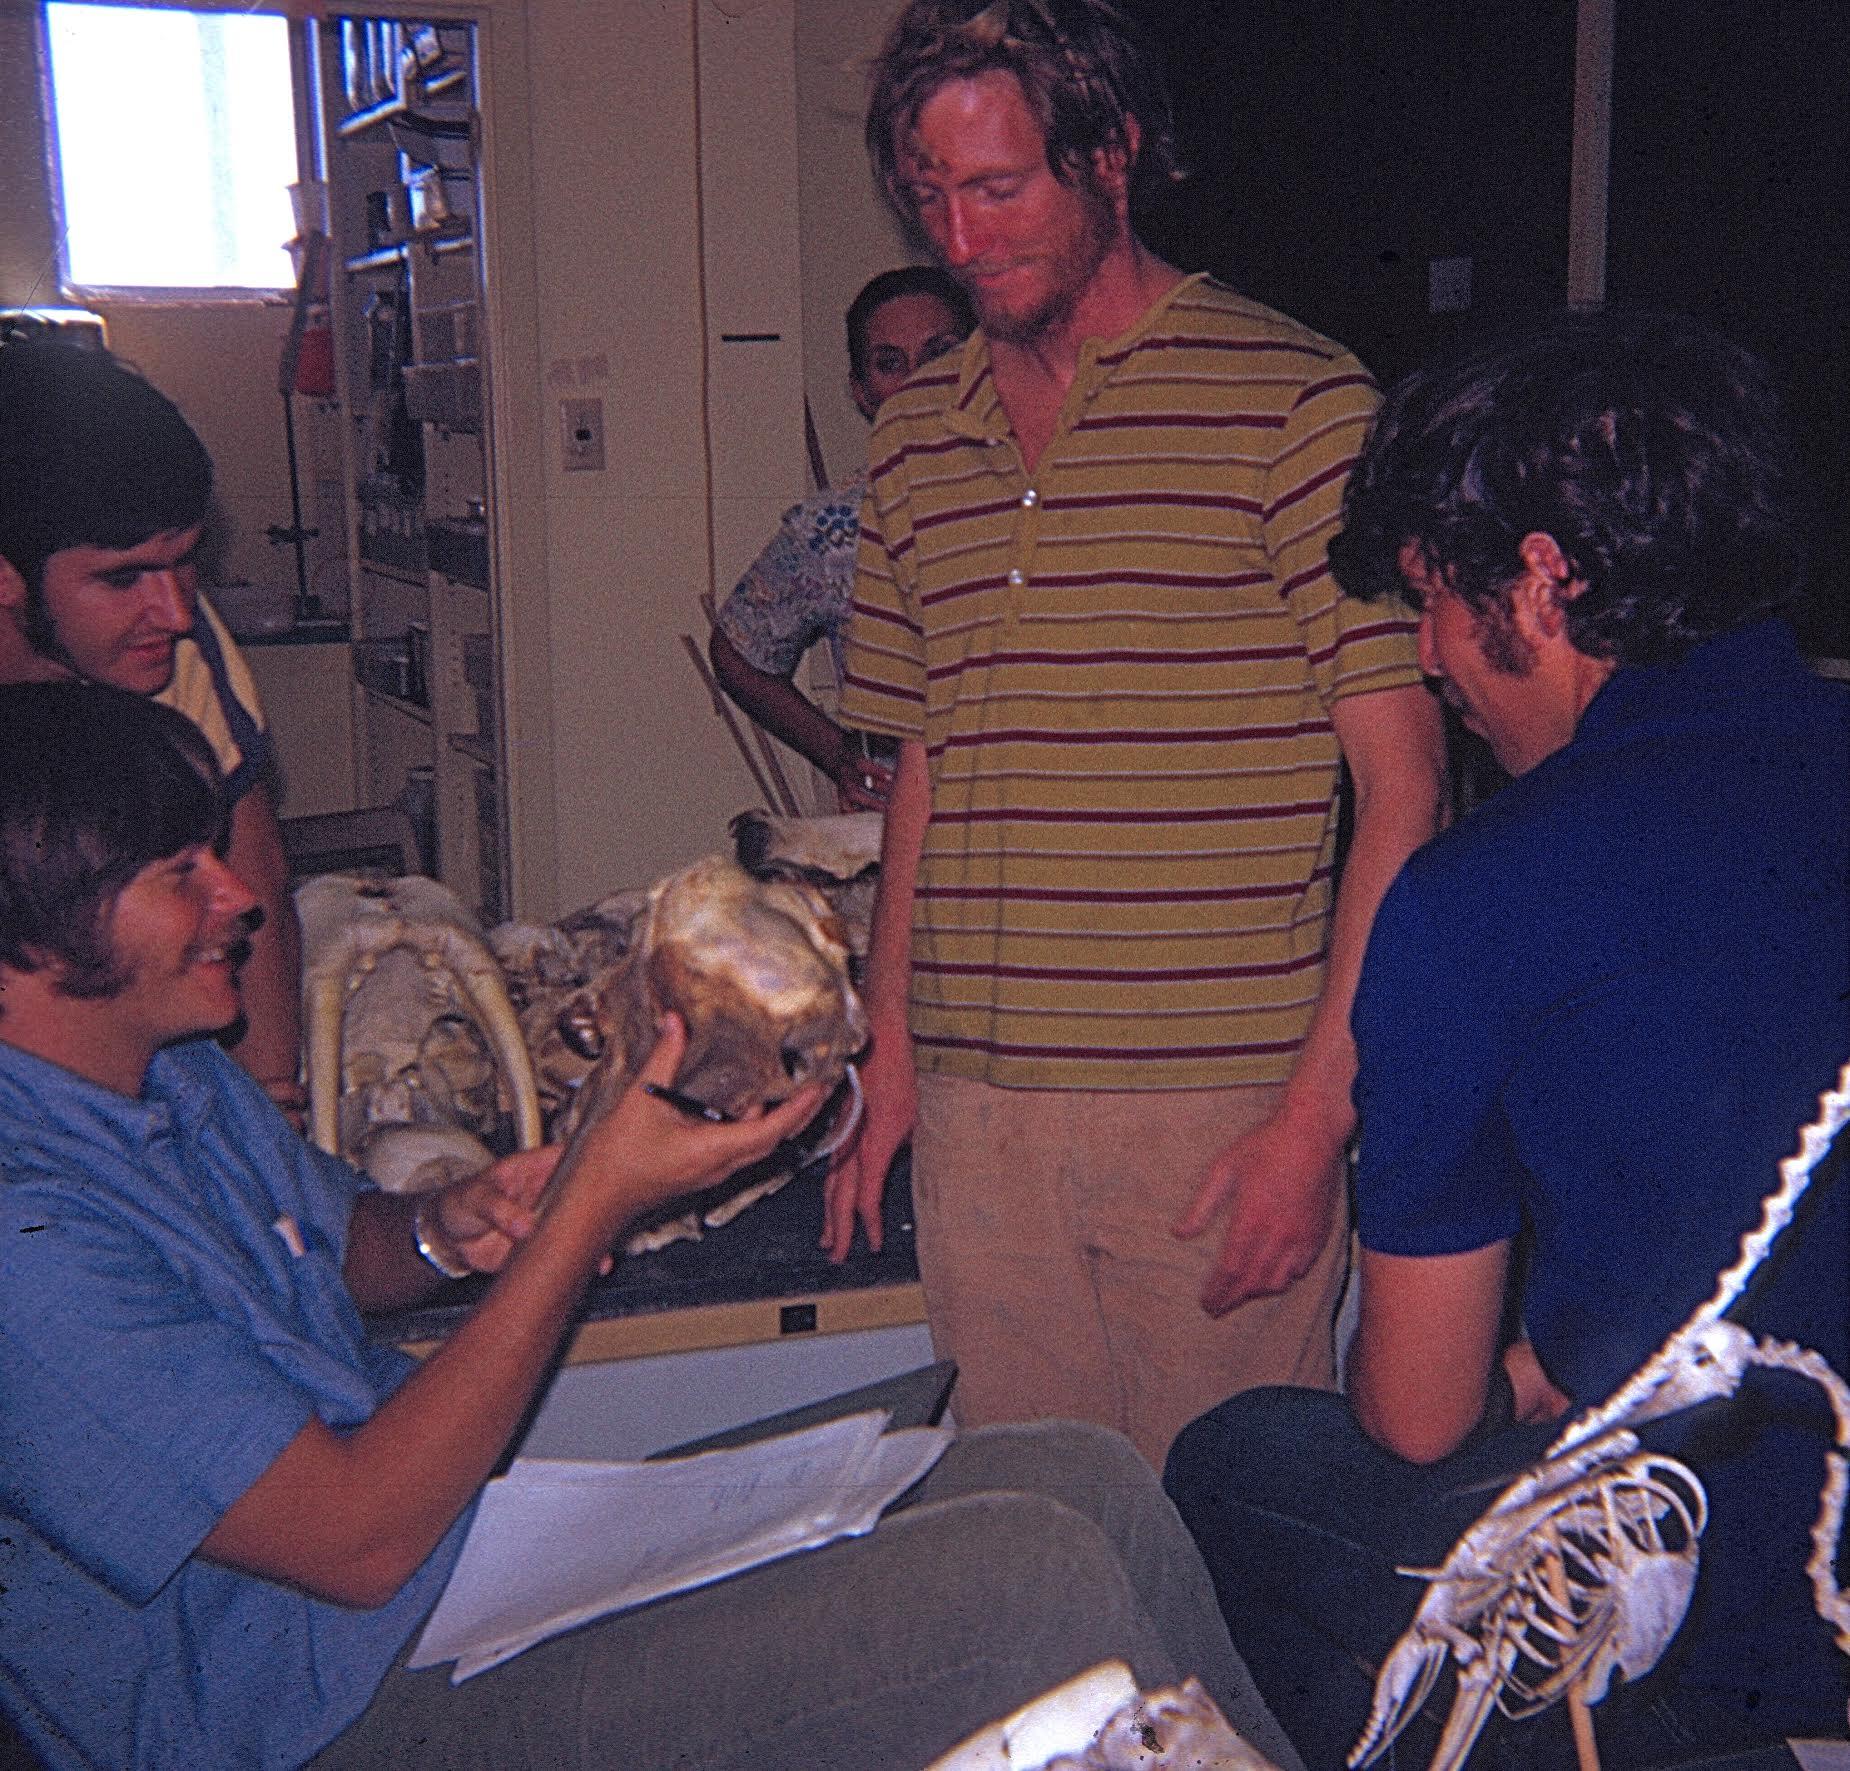 Milos et al. with mammal bones in museum McMasters Photo